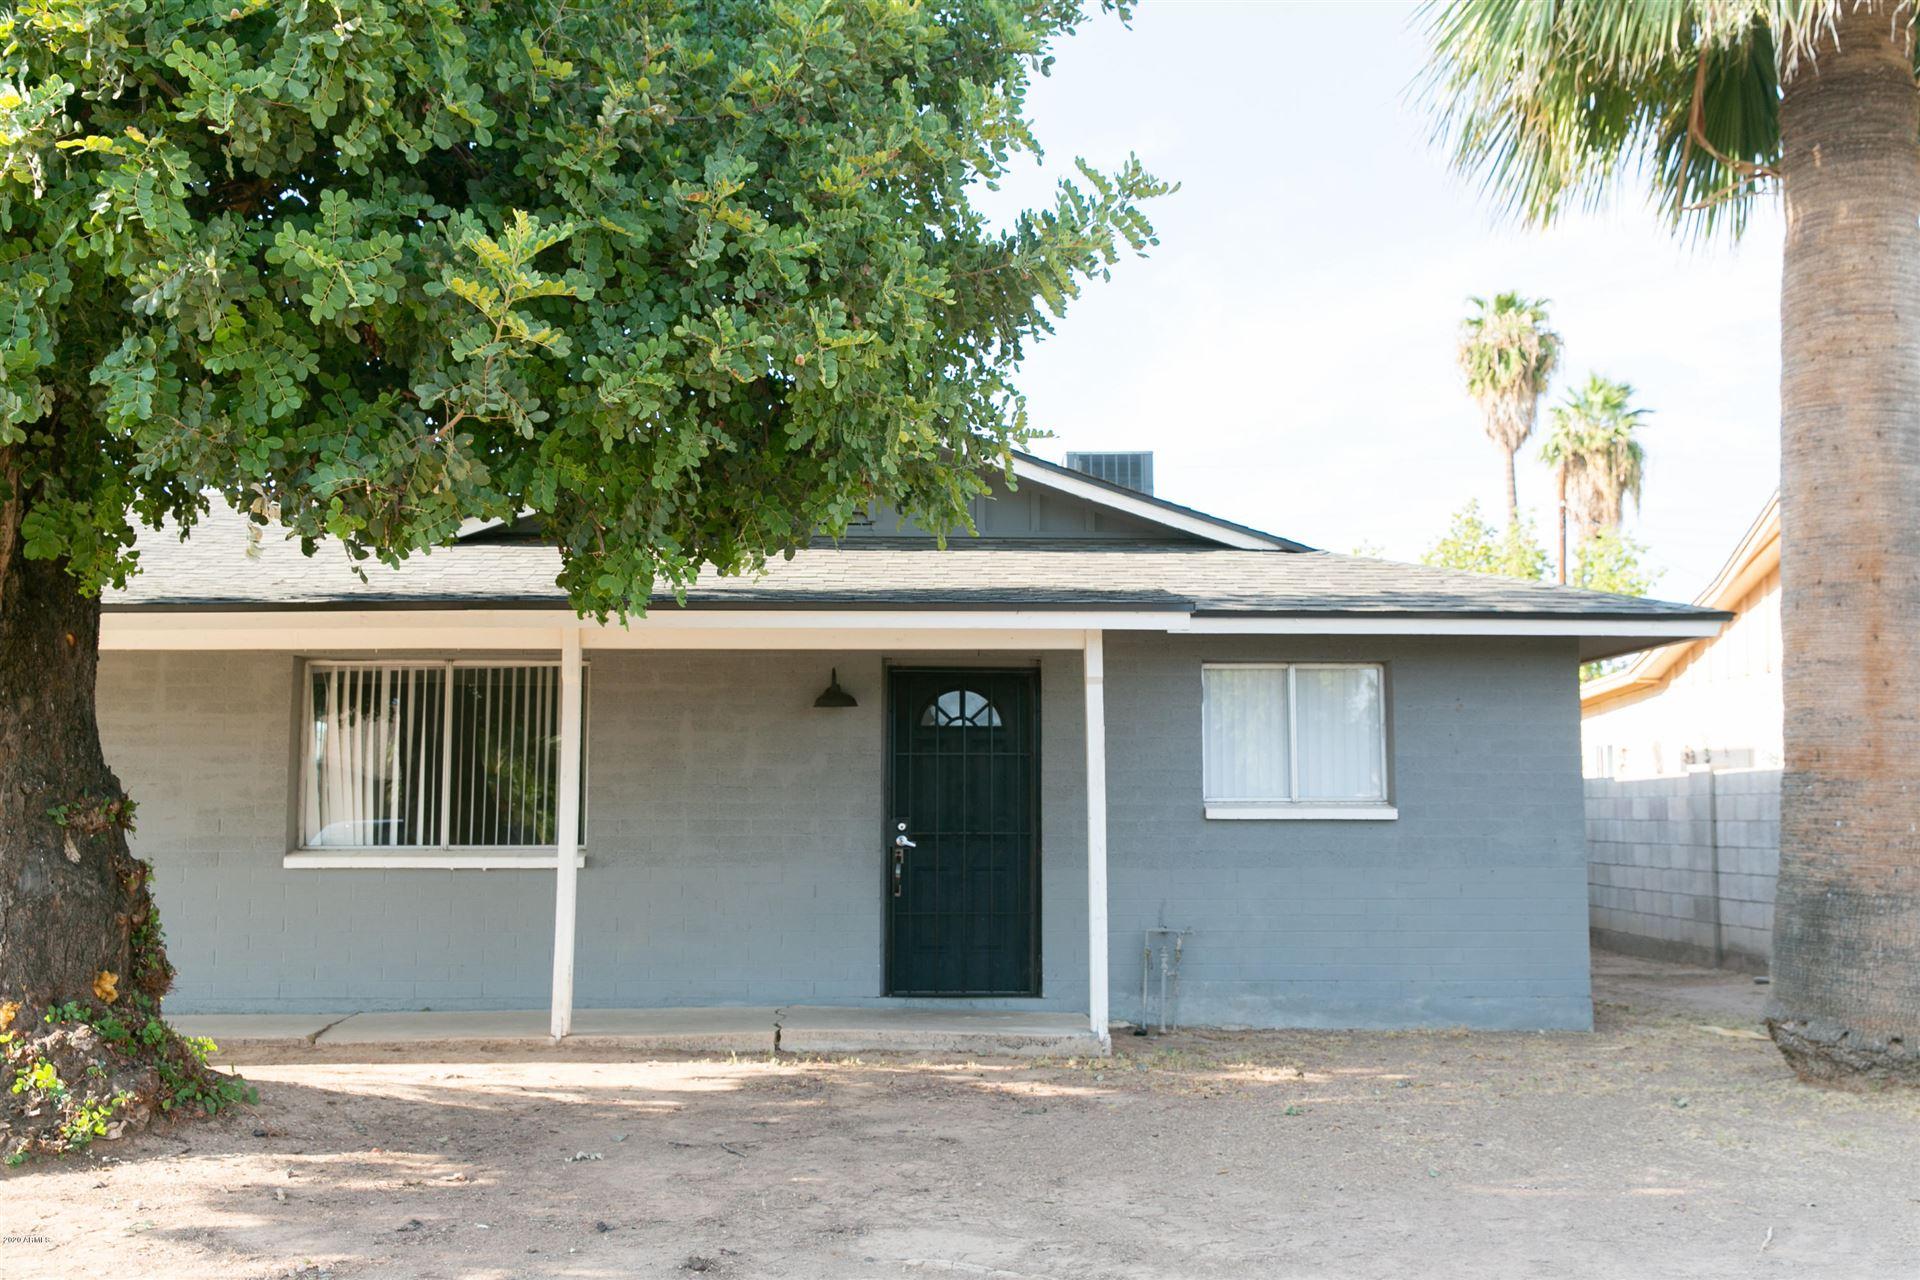 4136 W ORANGEWOOD Avenue, Phoenix, AZ 85051 - MLS#: 6066461